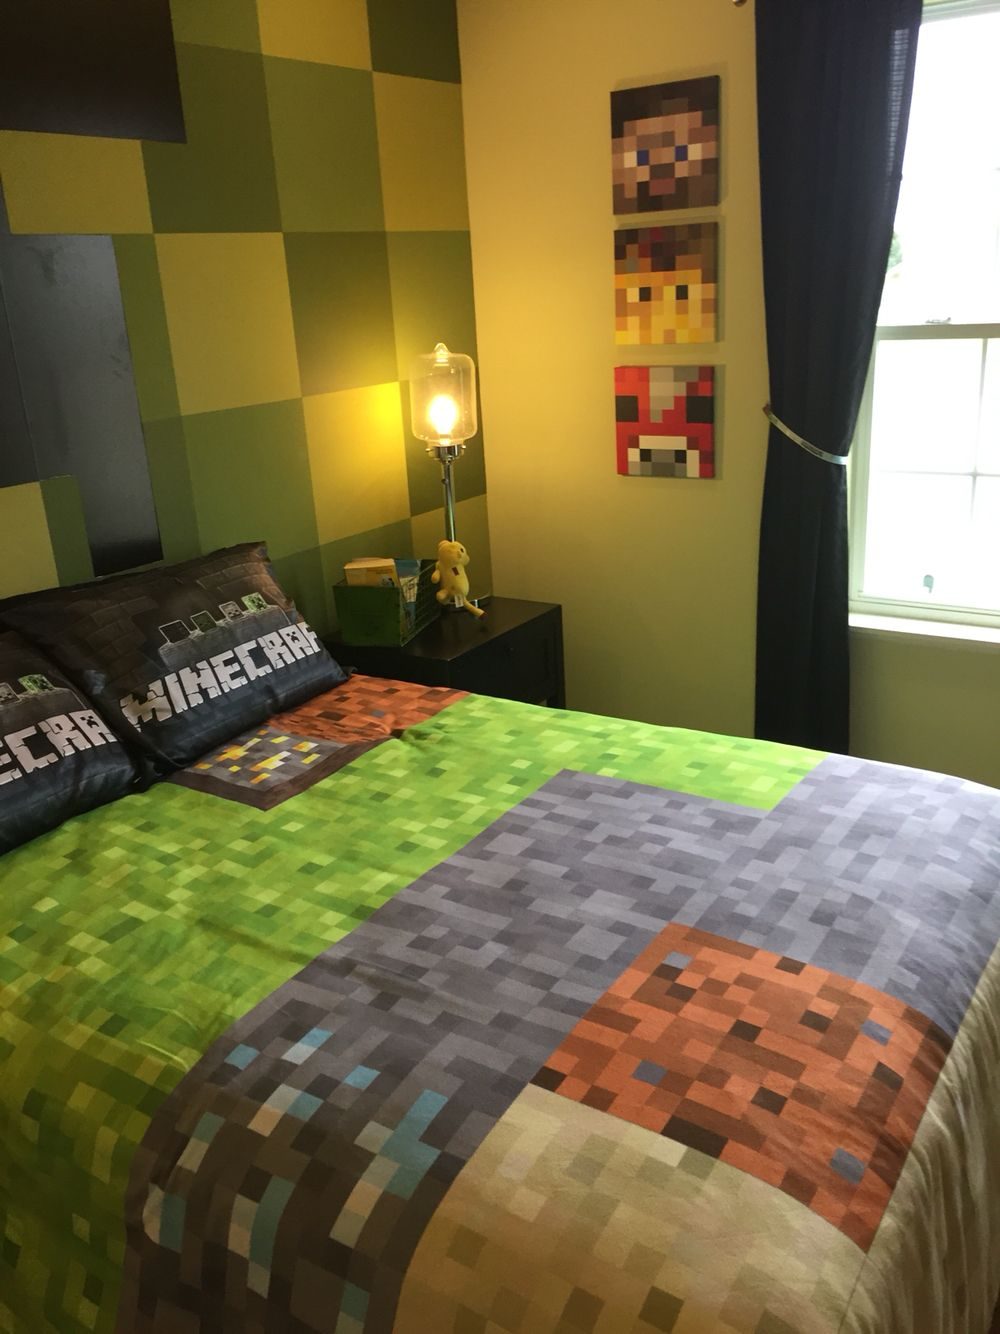 Minecraft Bedroom Decorations Quarto Minecraft Decoracao Quarto